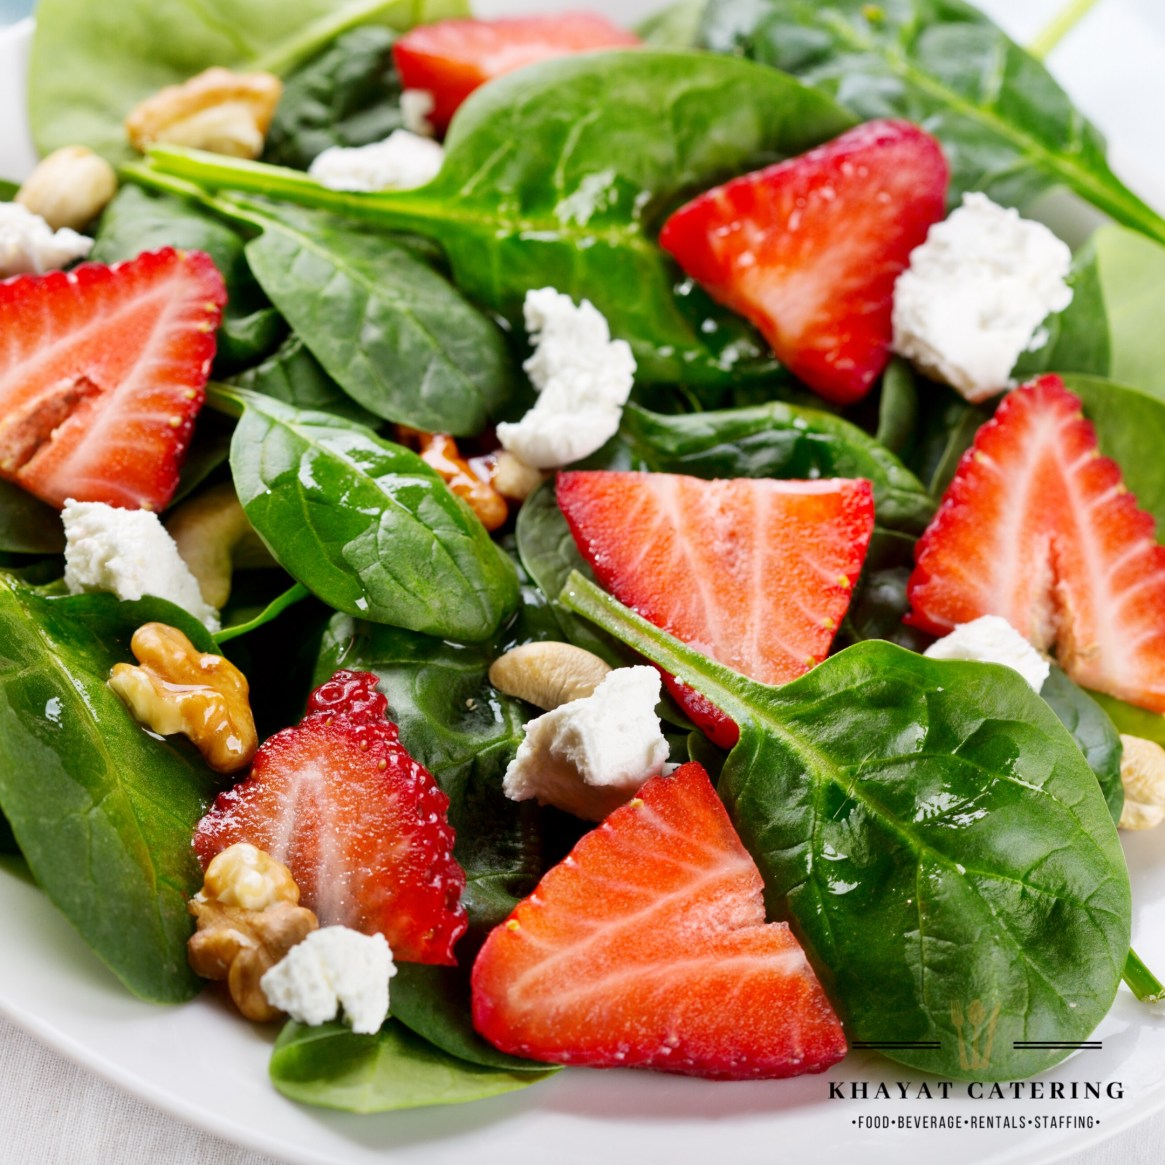 Khayat Catering strawberry Salad